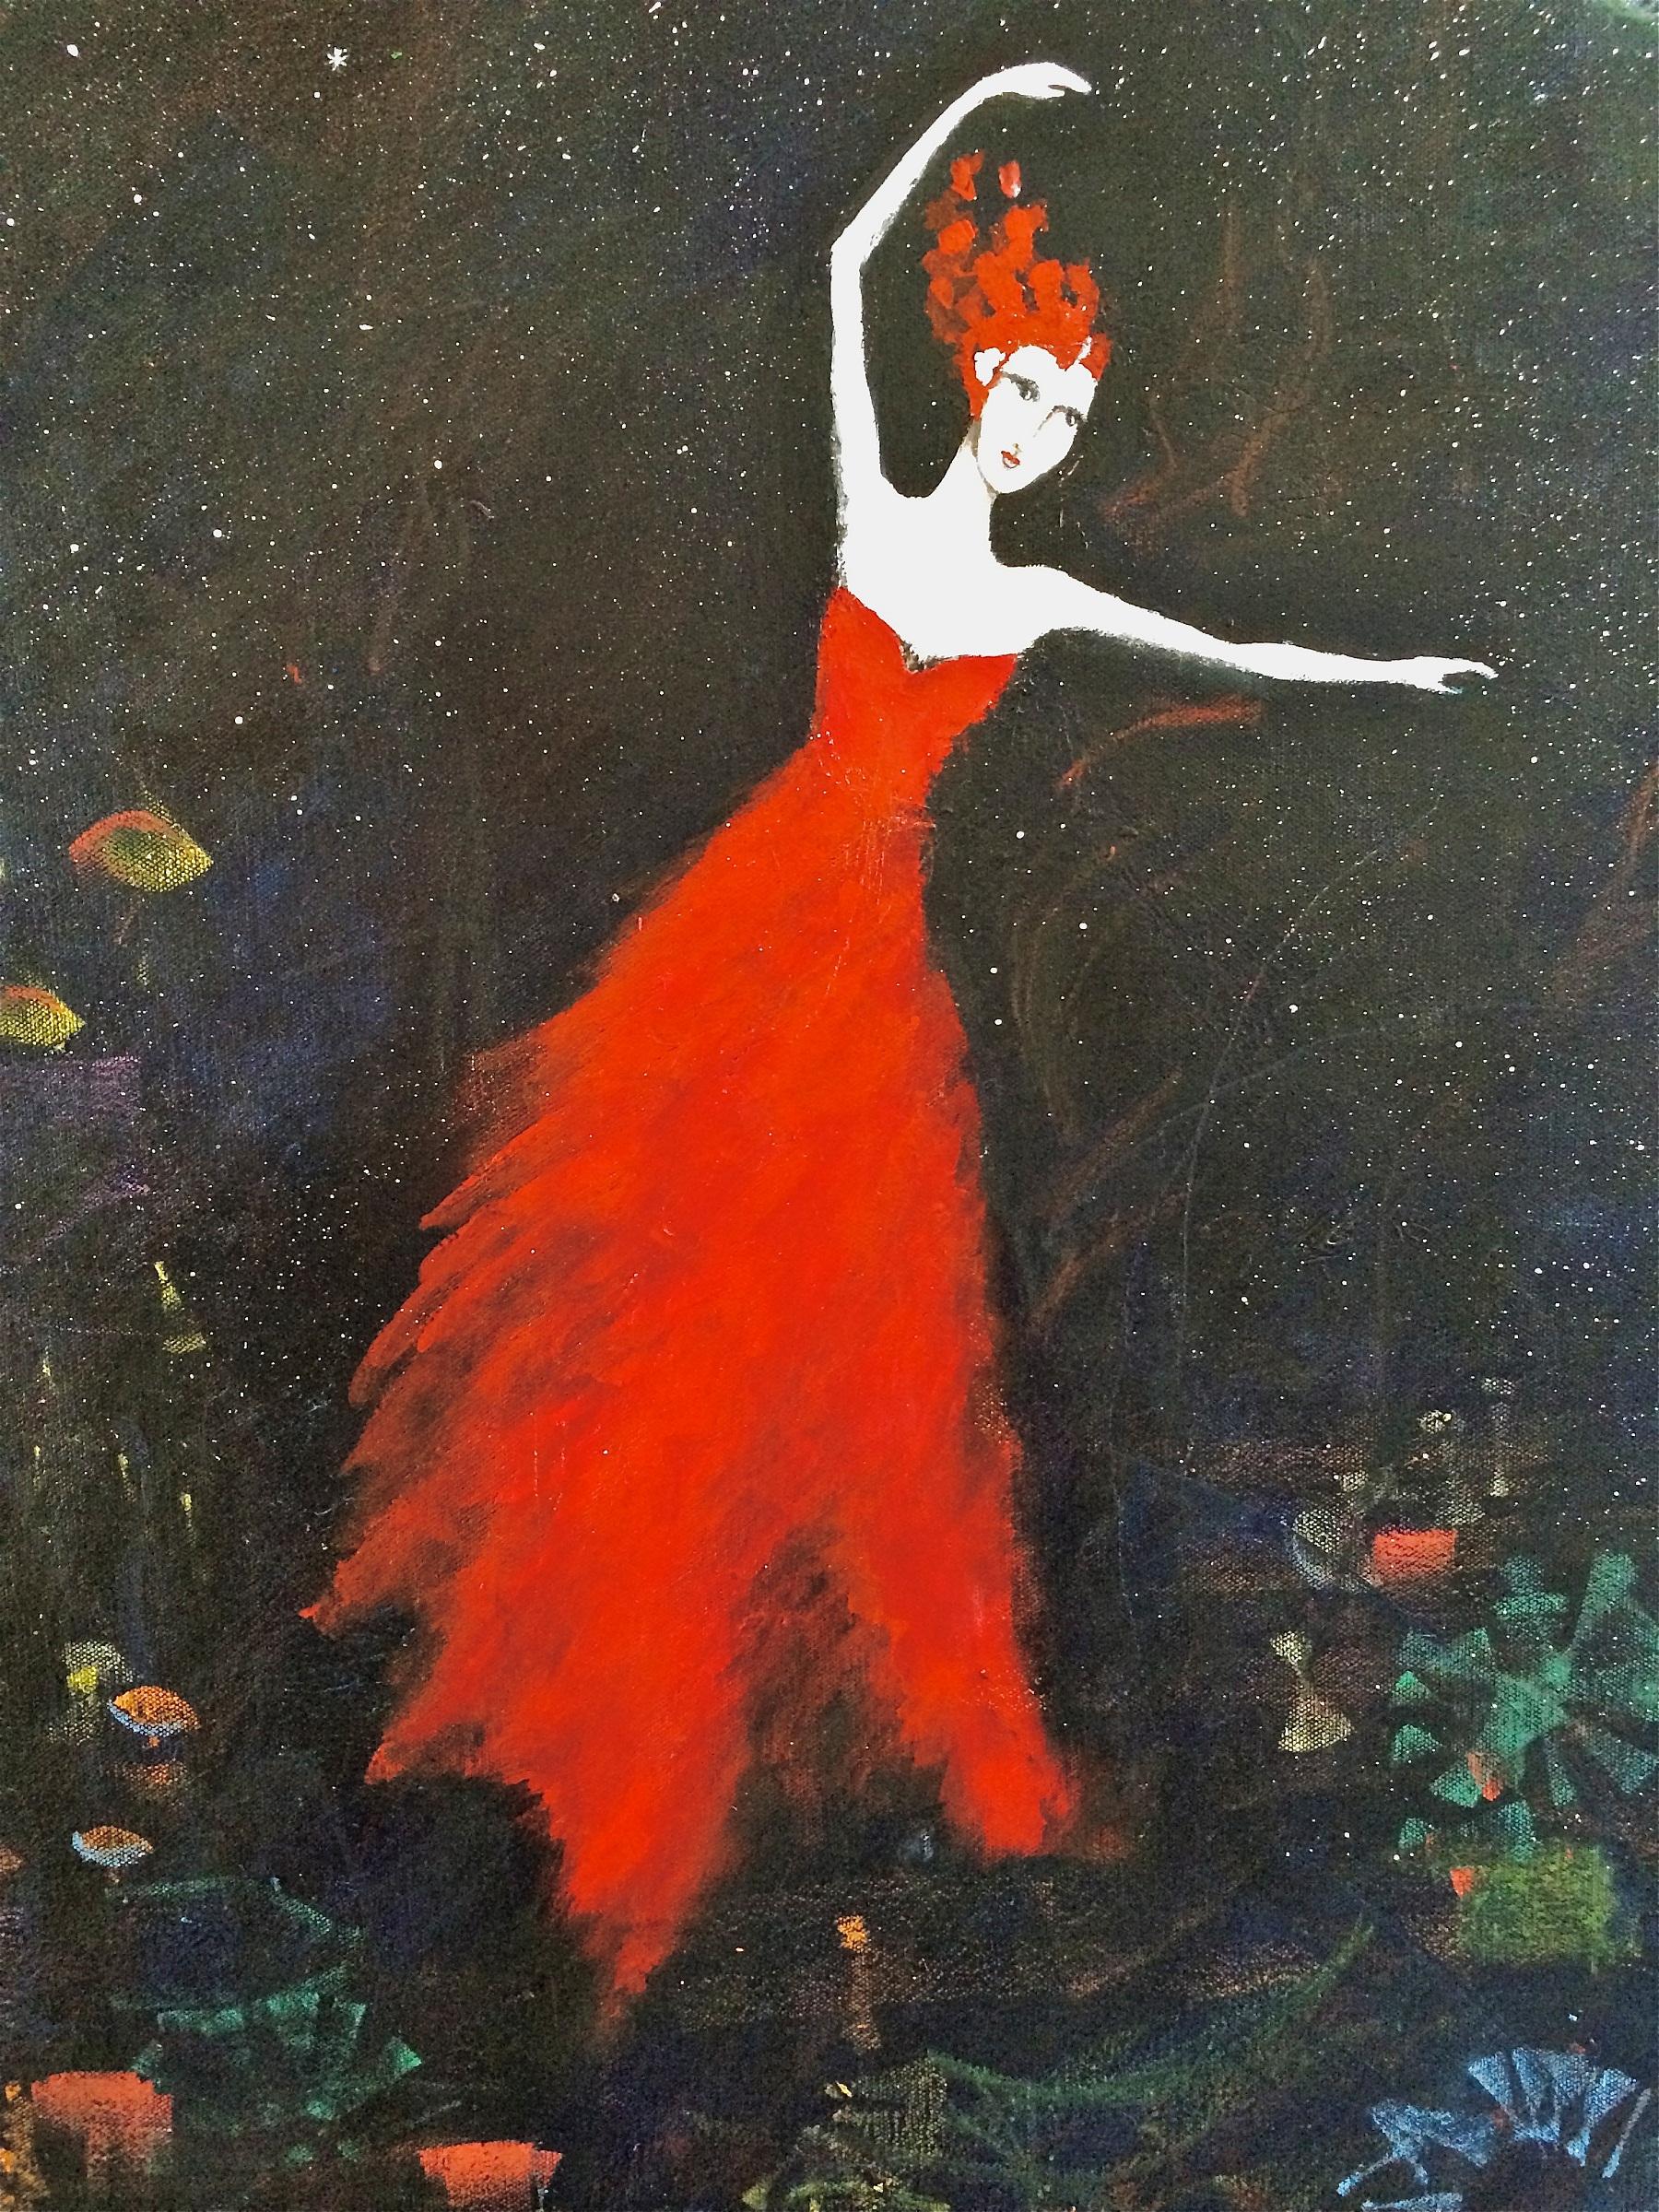 GRANADA DANCING IN TH... by Mrs. ANA MARINI - GENZON - Masterpiece Online